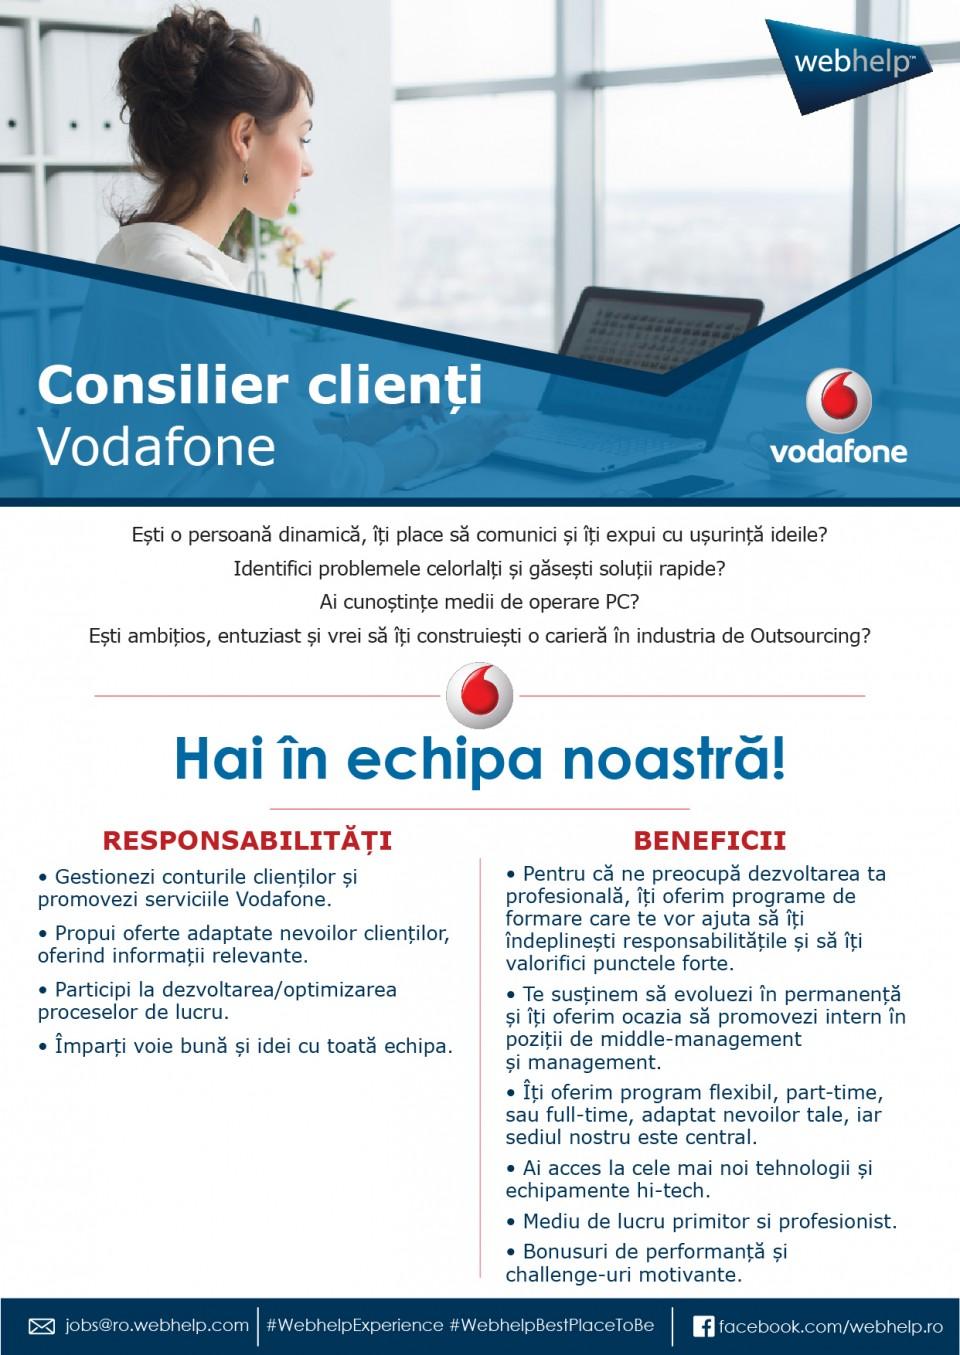 Consilier clienti Vodafone